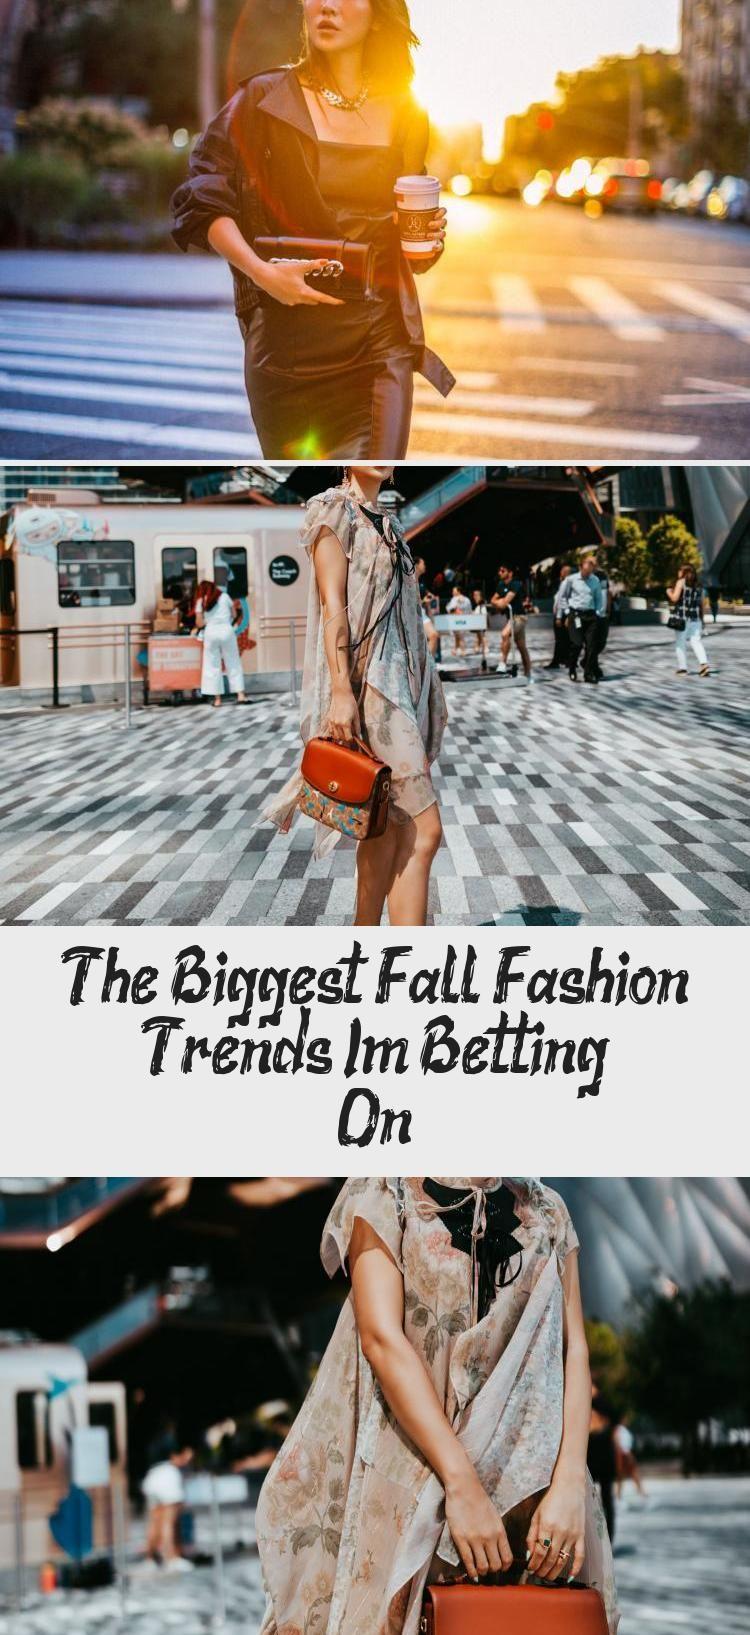 Monmore green betting trends sikkim online sports betting news 2011